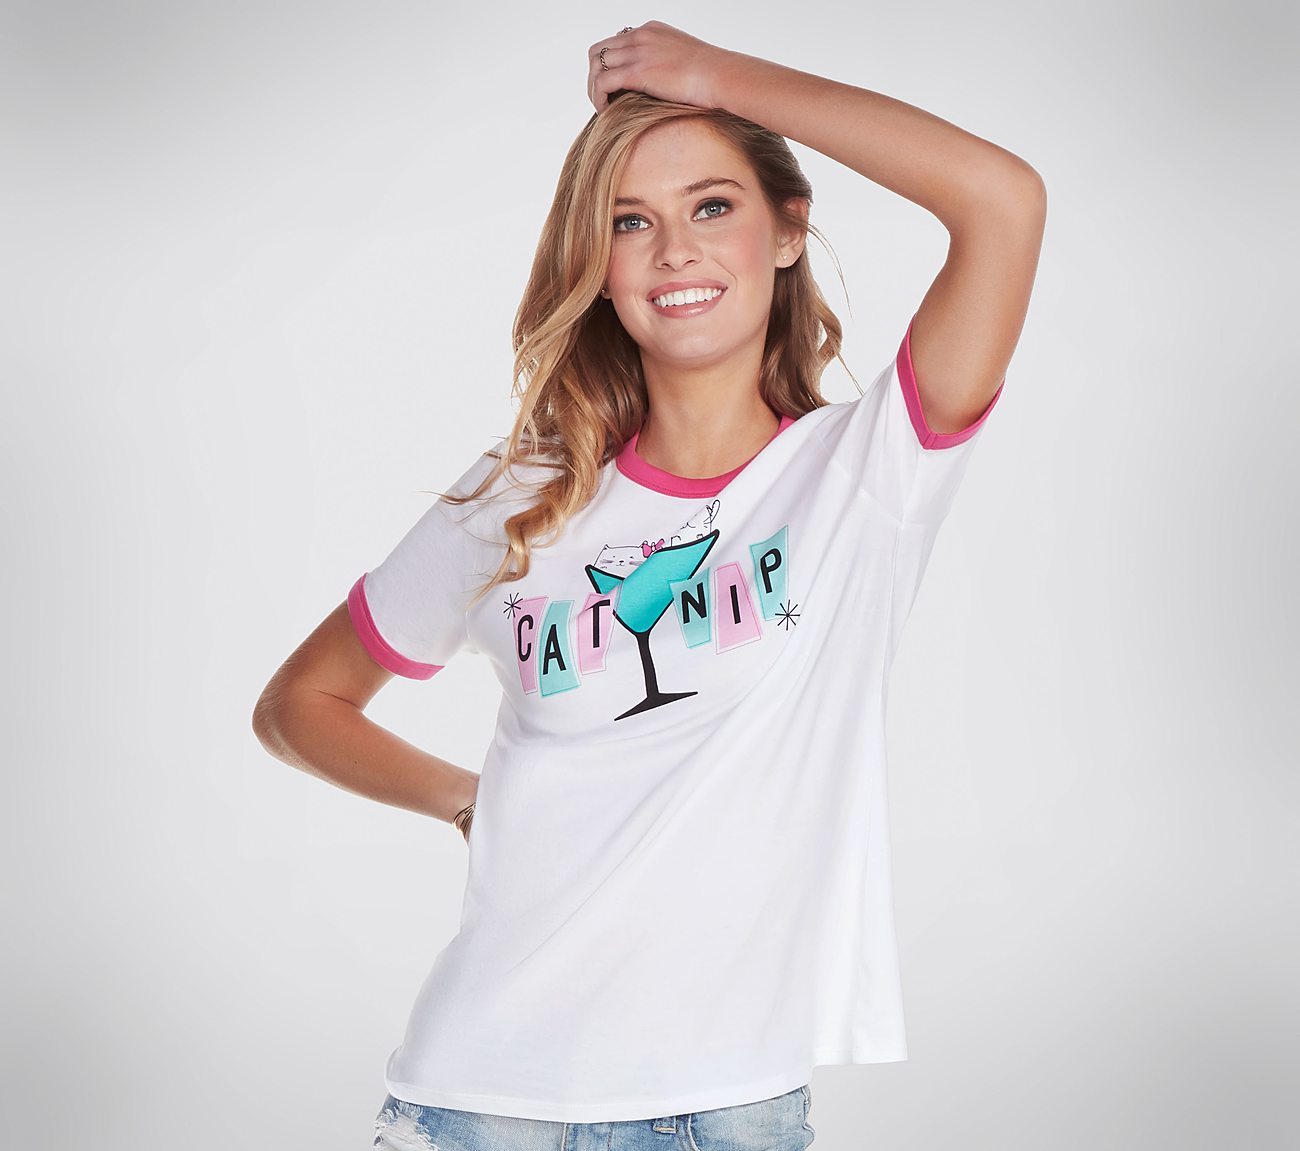 BOBS for Cats Catnip Ringer Tee Shirt